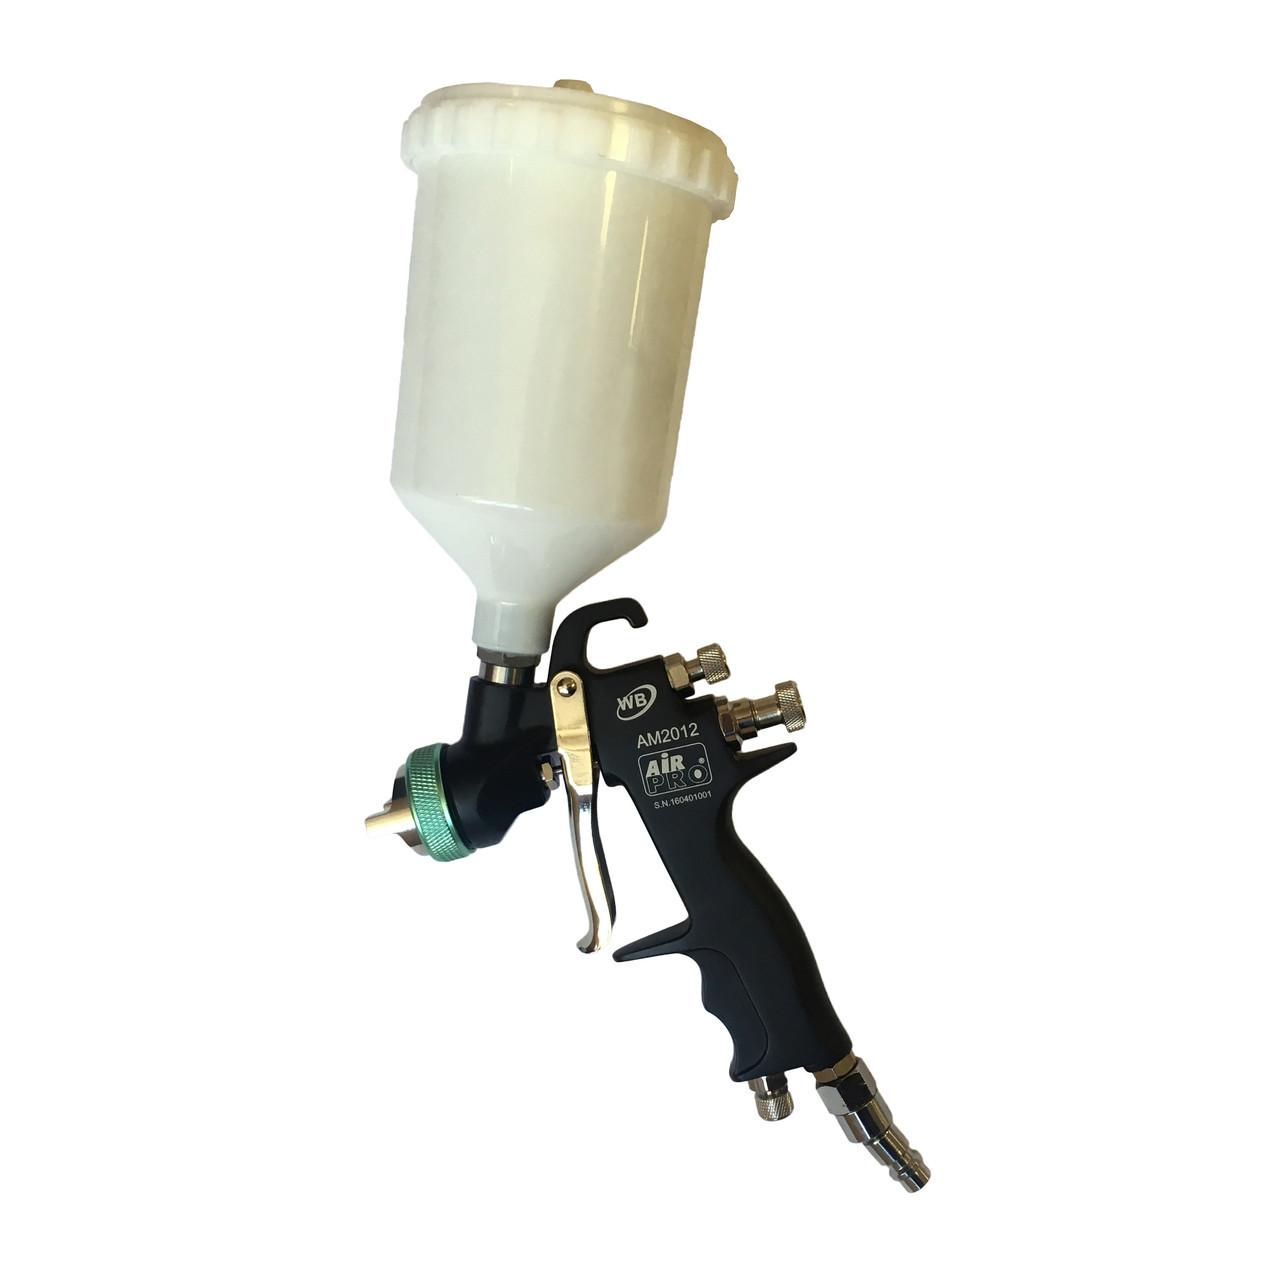 Краскопульт пневматический (1,3 мм) Air Pro  AM2012/HVLP WB-1.3 (Тайвань)